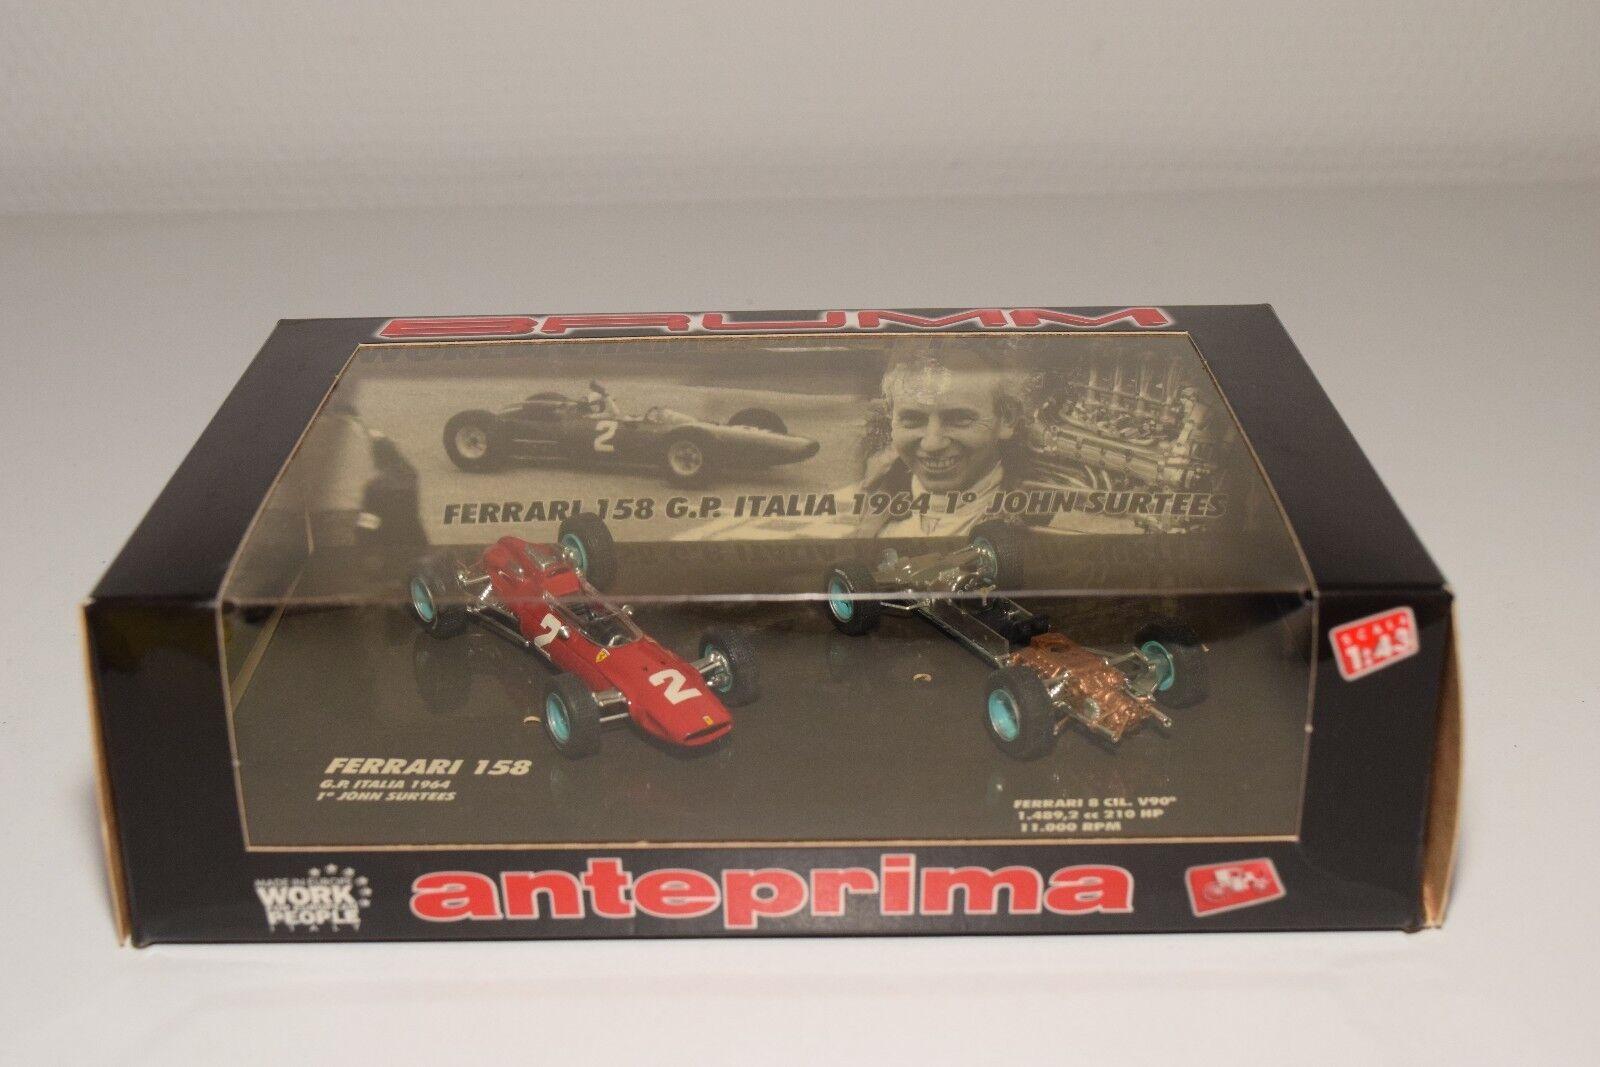 Esperando por ti V 1 1 1 43 BRUMM A001 FERRARI 158 GRAND PRIX ITALIA ITALY 1964 SURTEES MINT BOXED  Ahorre 35% - 70% de descuento